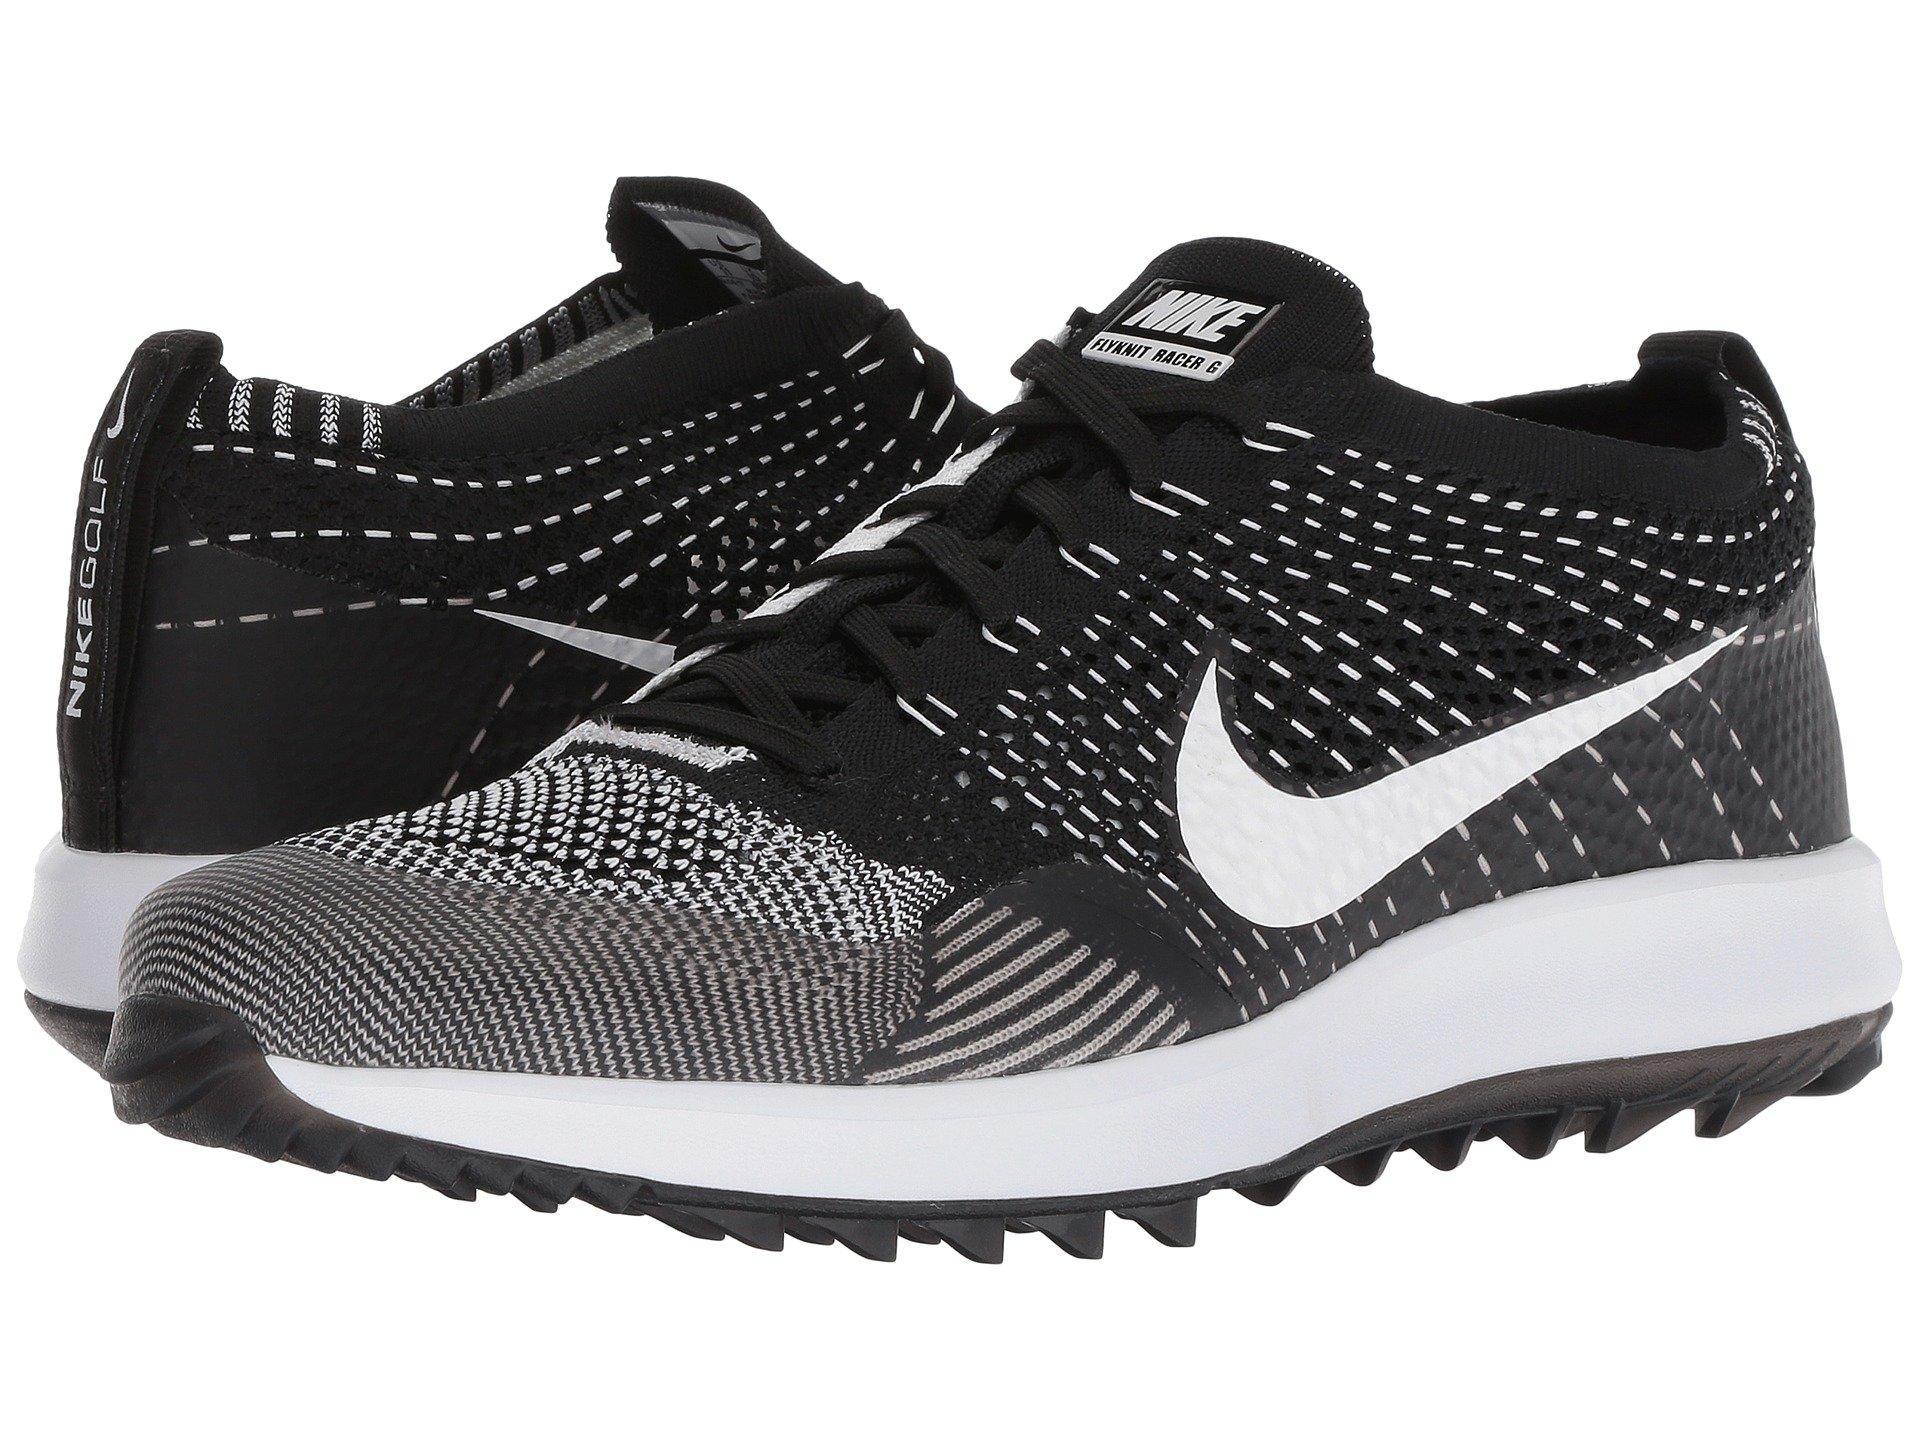 785d2835b8fb1 Lyst - Nike Flyknit Racer G in Black for Men - Save 4%